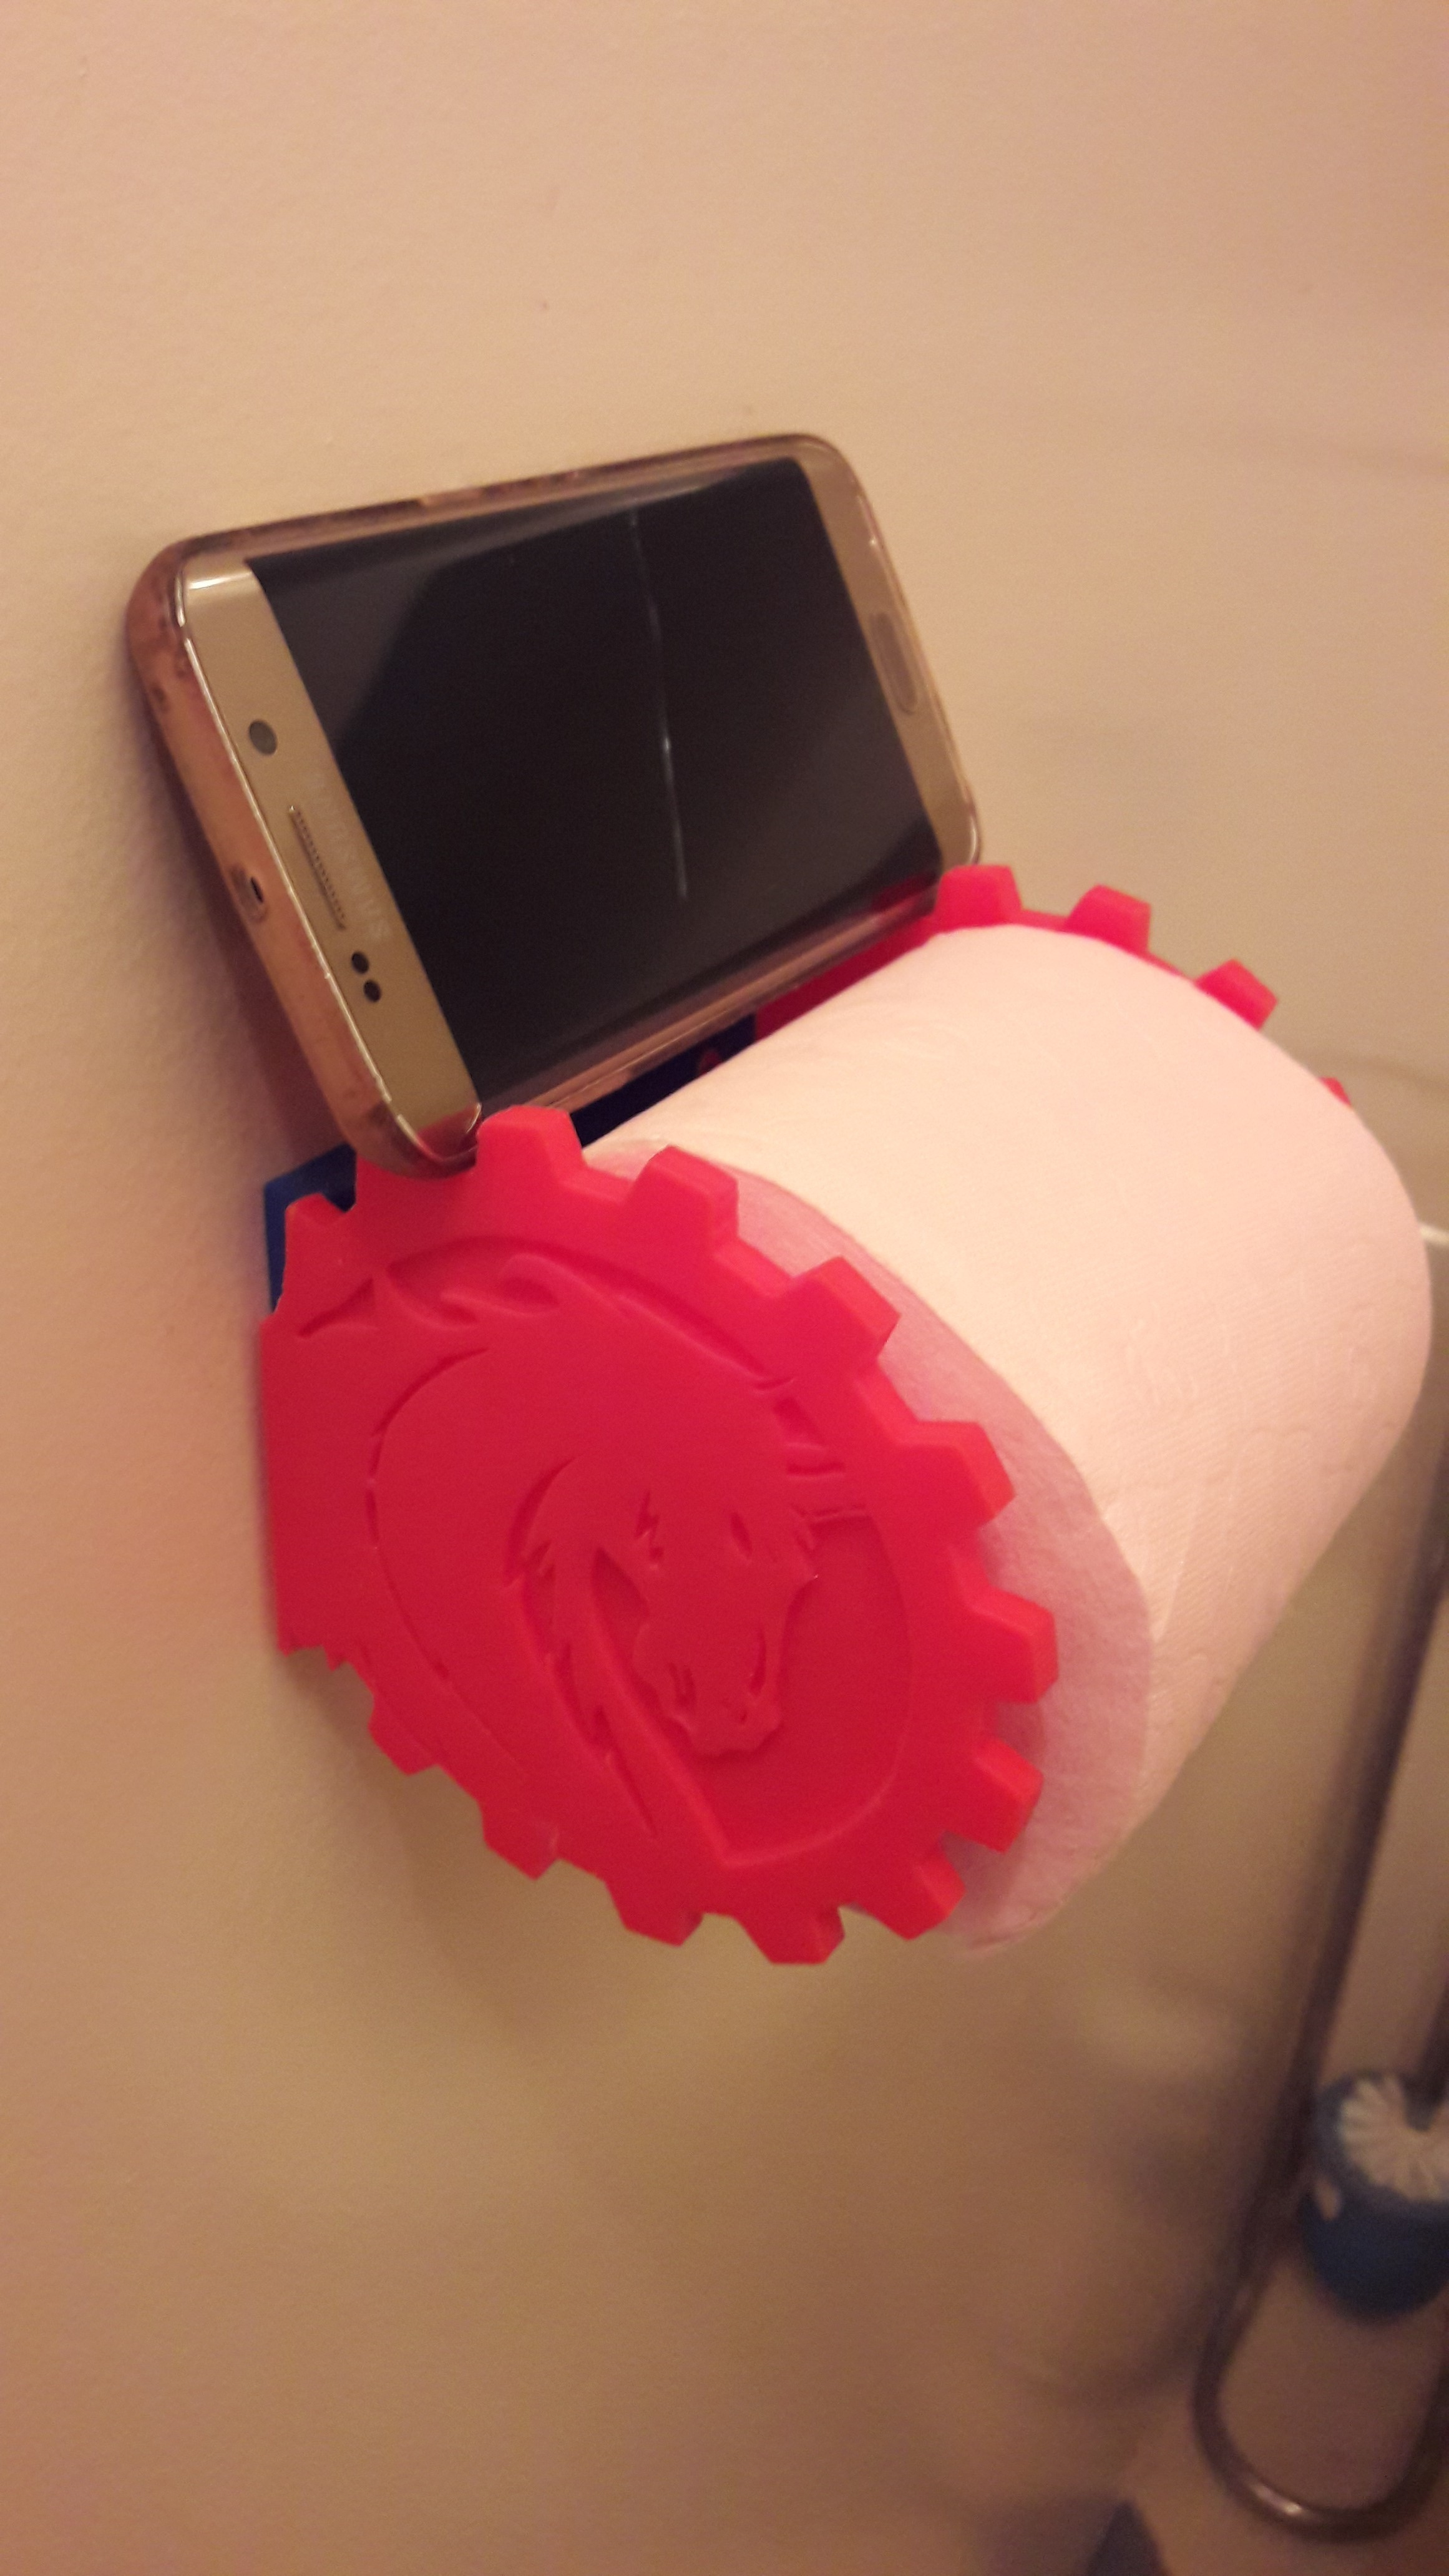 20171130_190321.jpg Download free STL file toilet paper holder • 3D print object, charlybegood